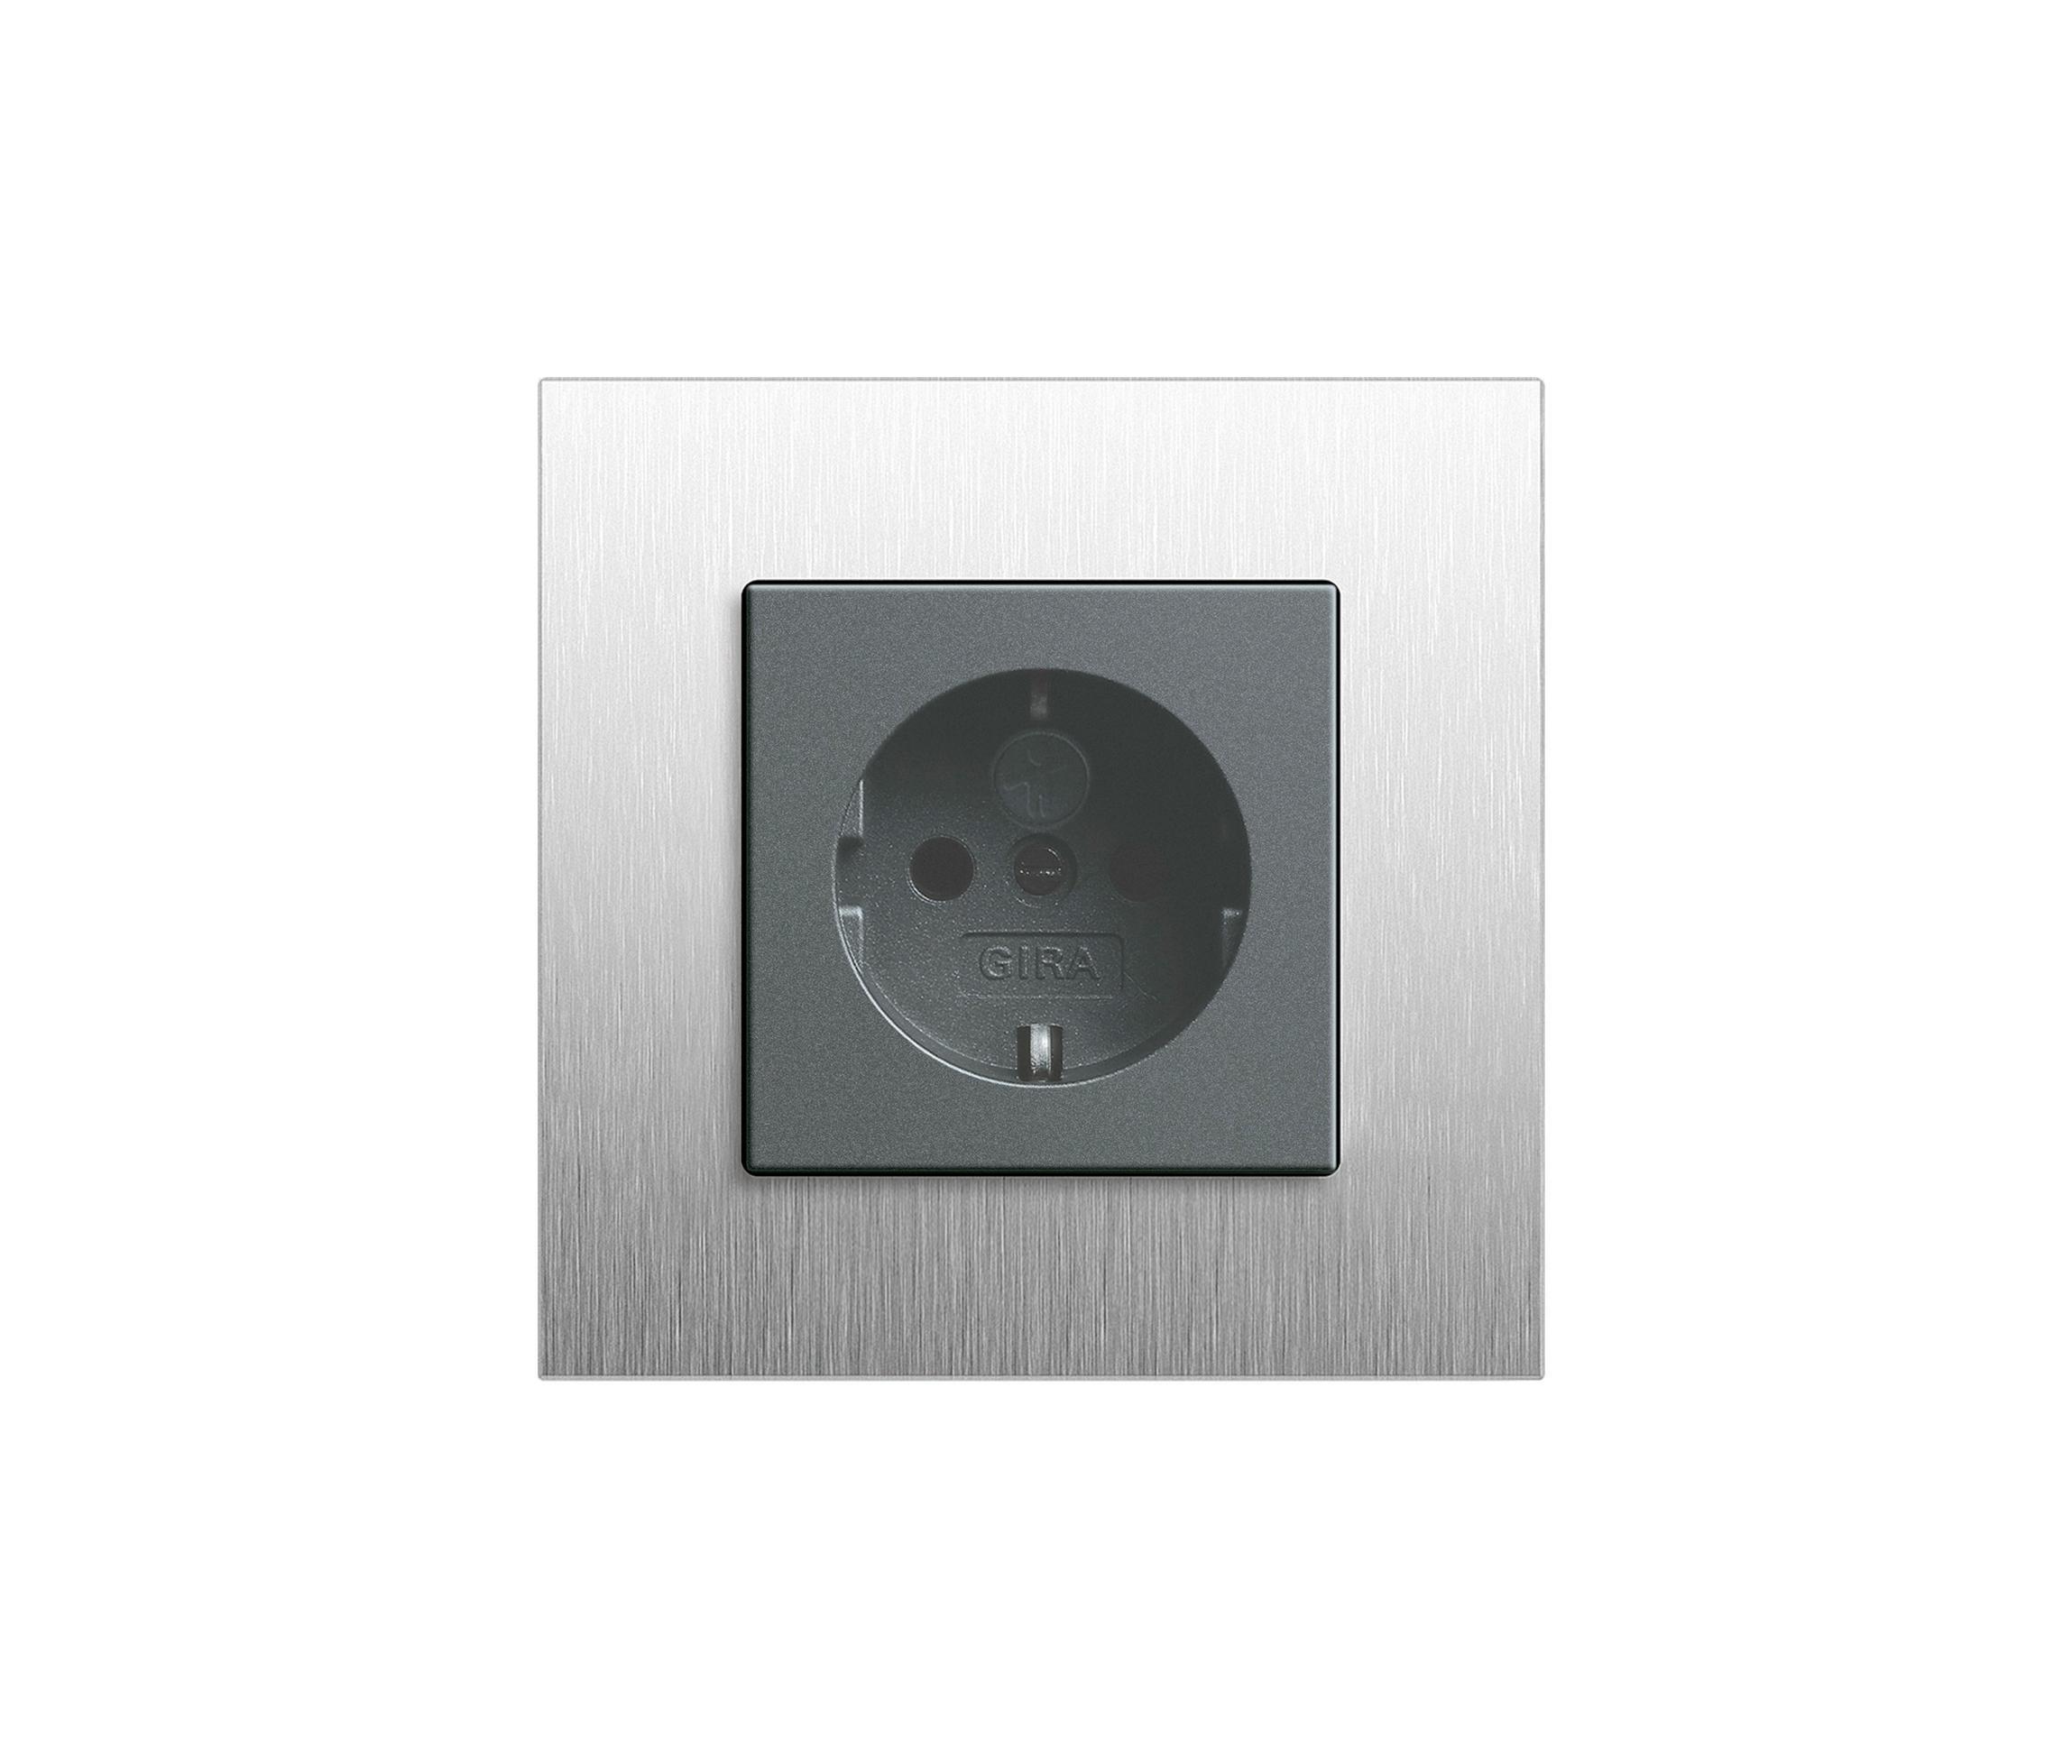 esprit stainless steel switch range schuko sockets. Black Bedroom Furniture Sets. Home Design Ideas